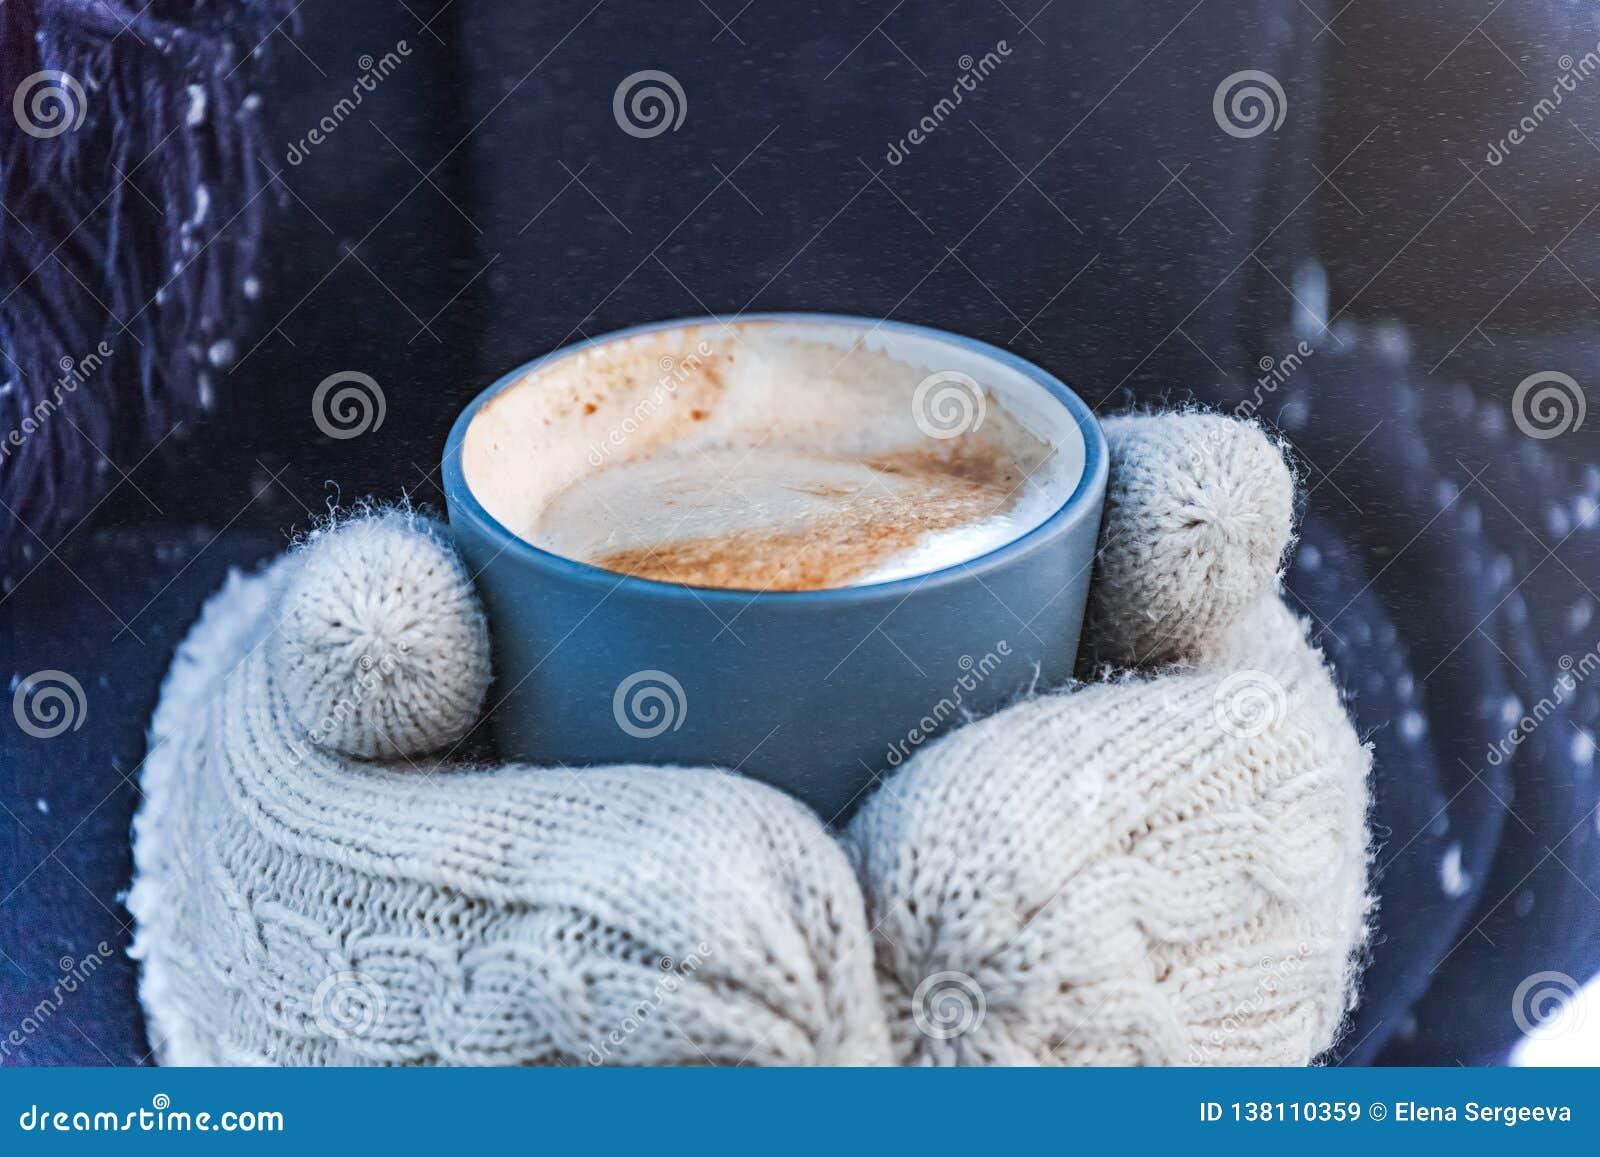 Winter coffee in snow street